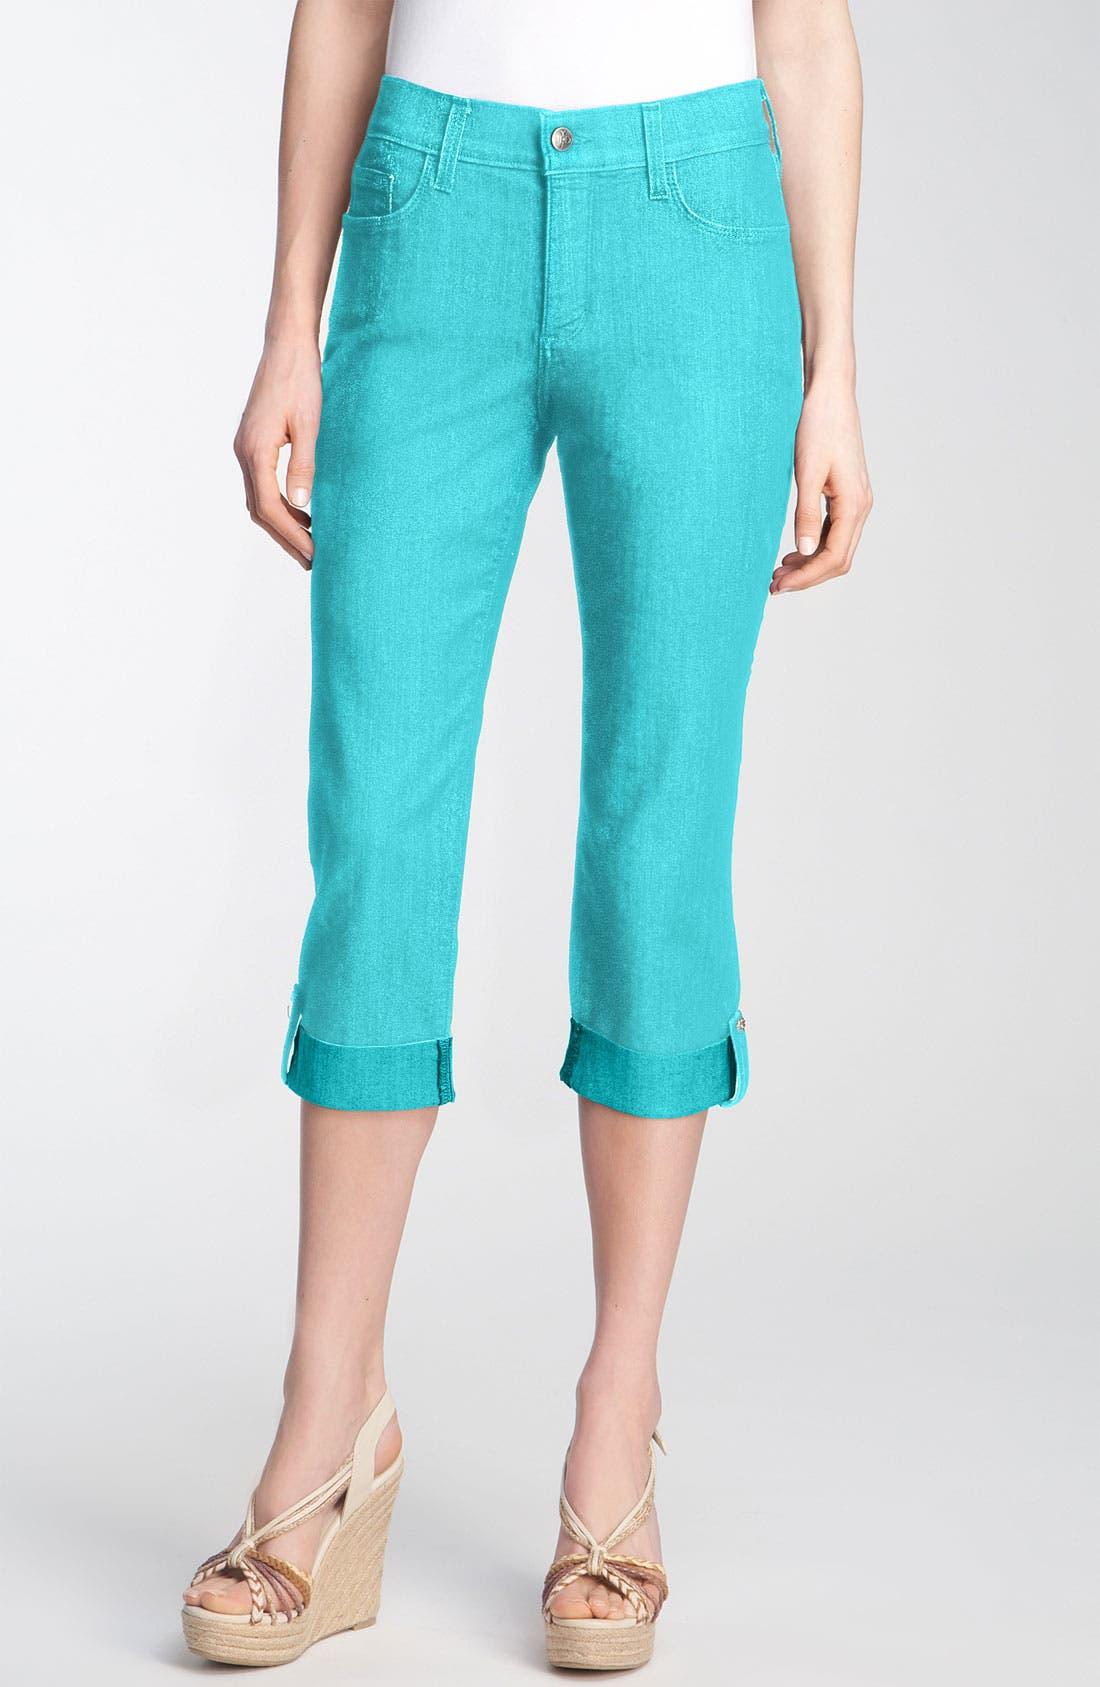 Alternate Image 1 Selected - NYDJ 'Carmen' Stretch Twill Crop Jeans (Petite)